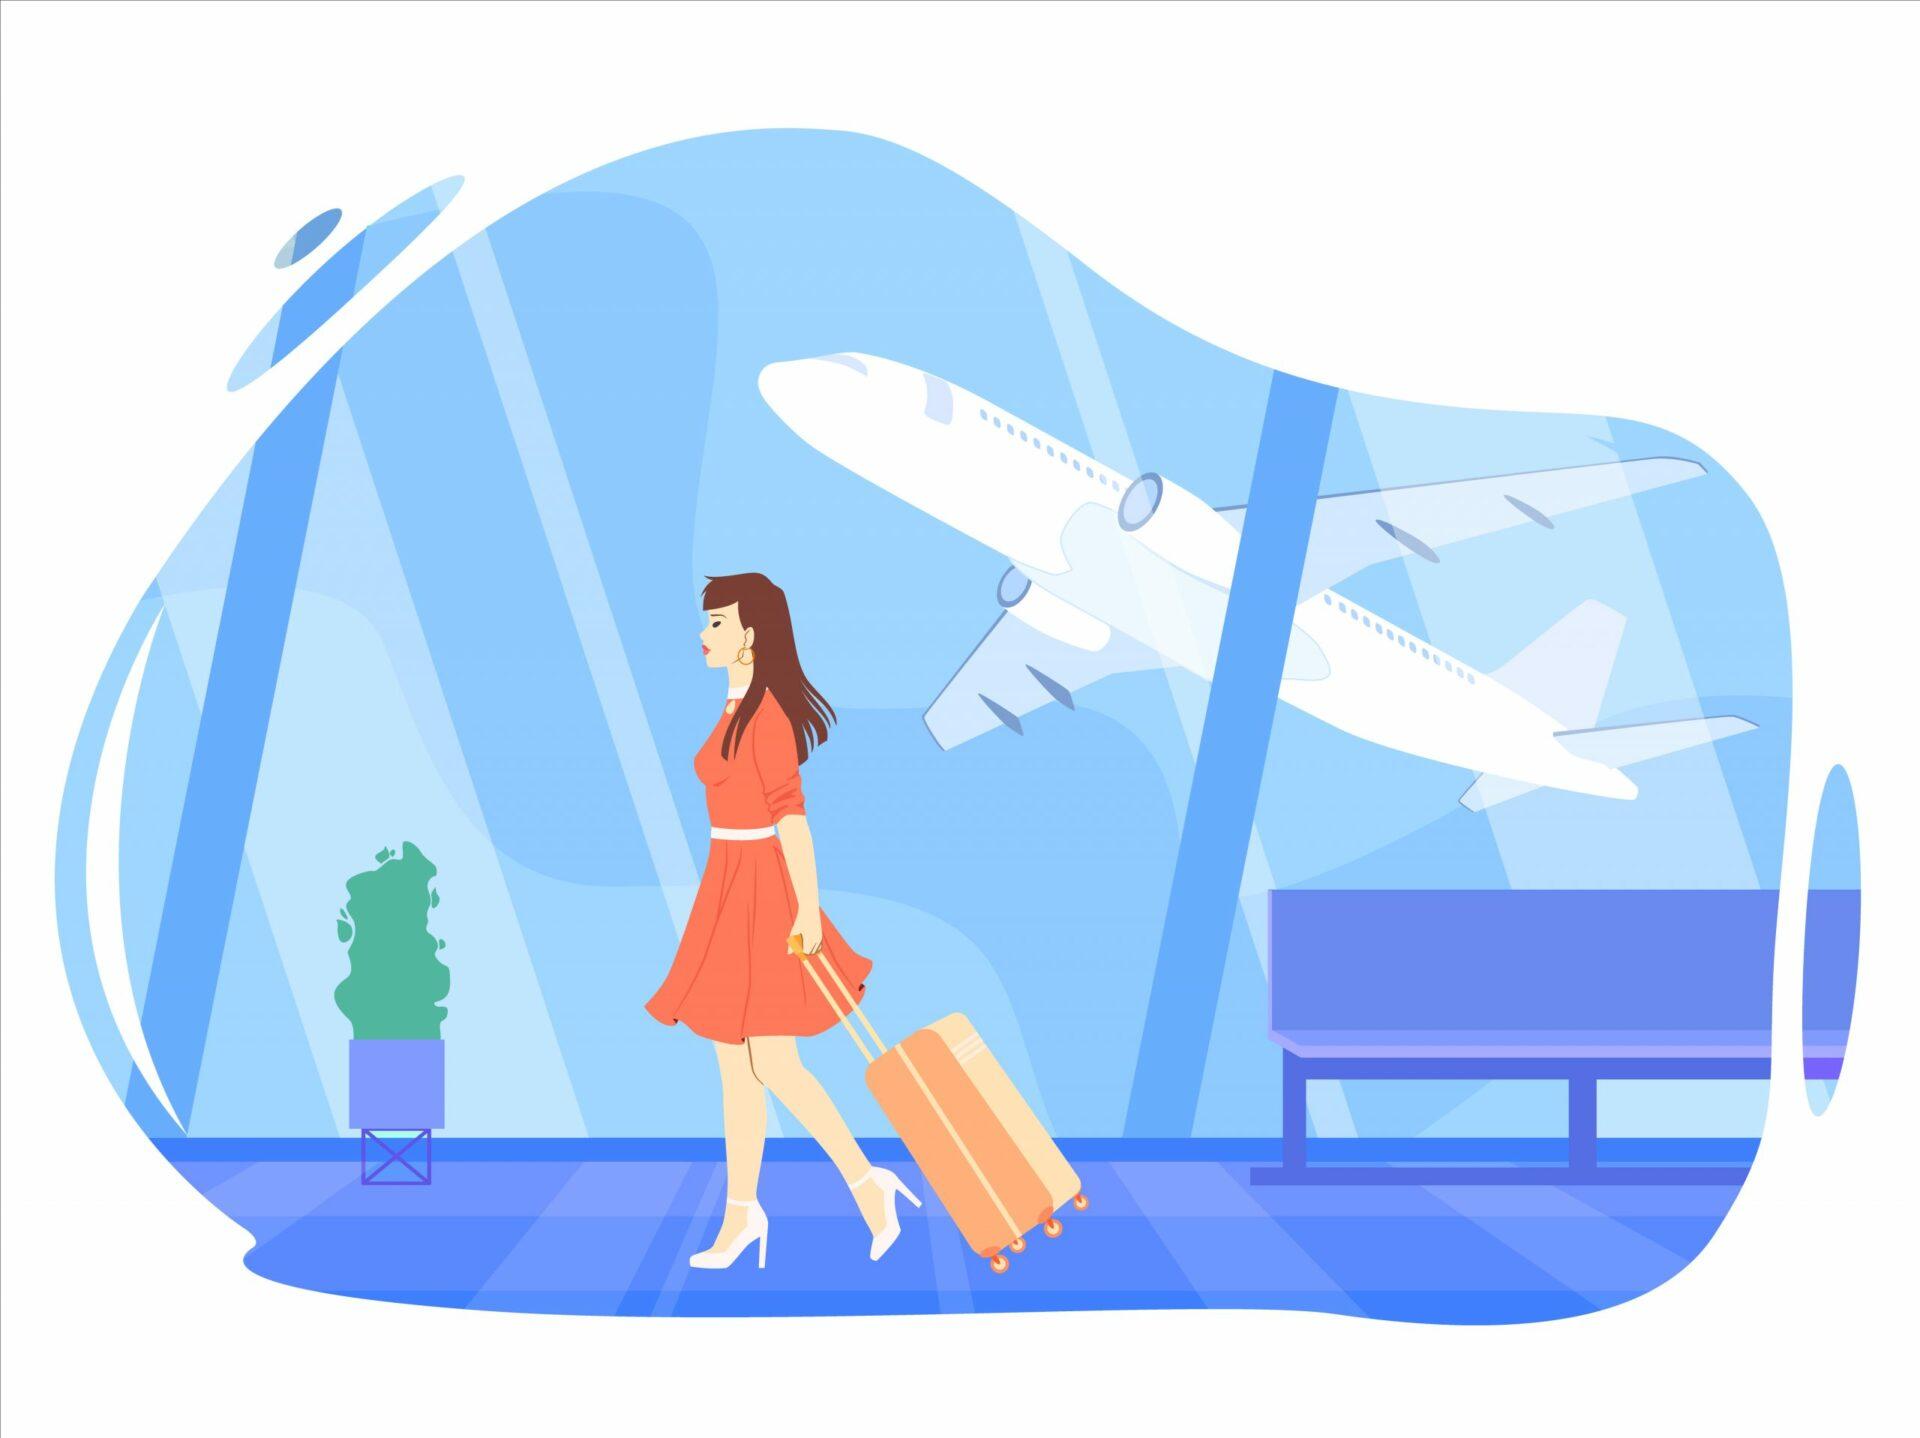 aeropuerto chica con maleta